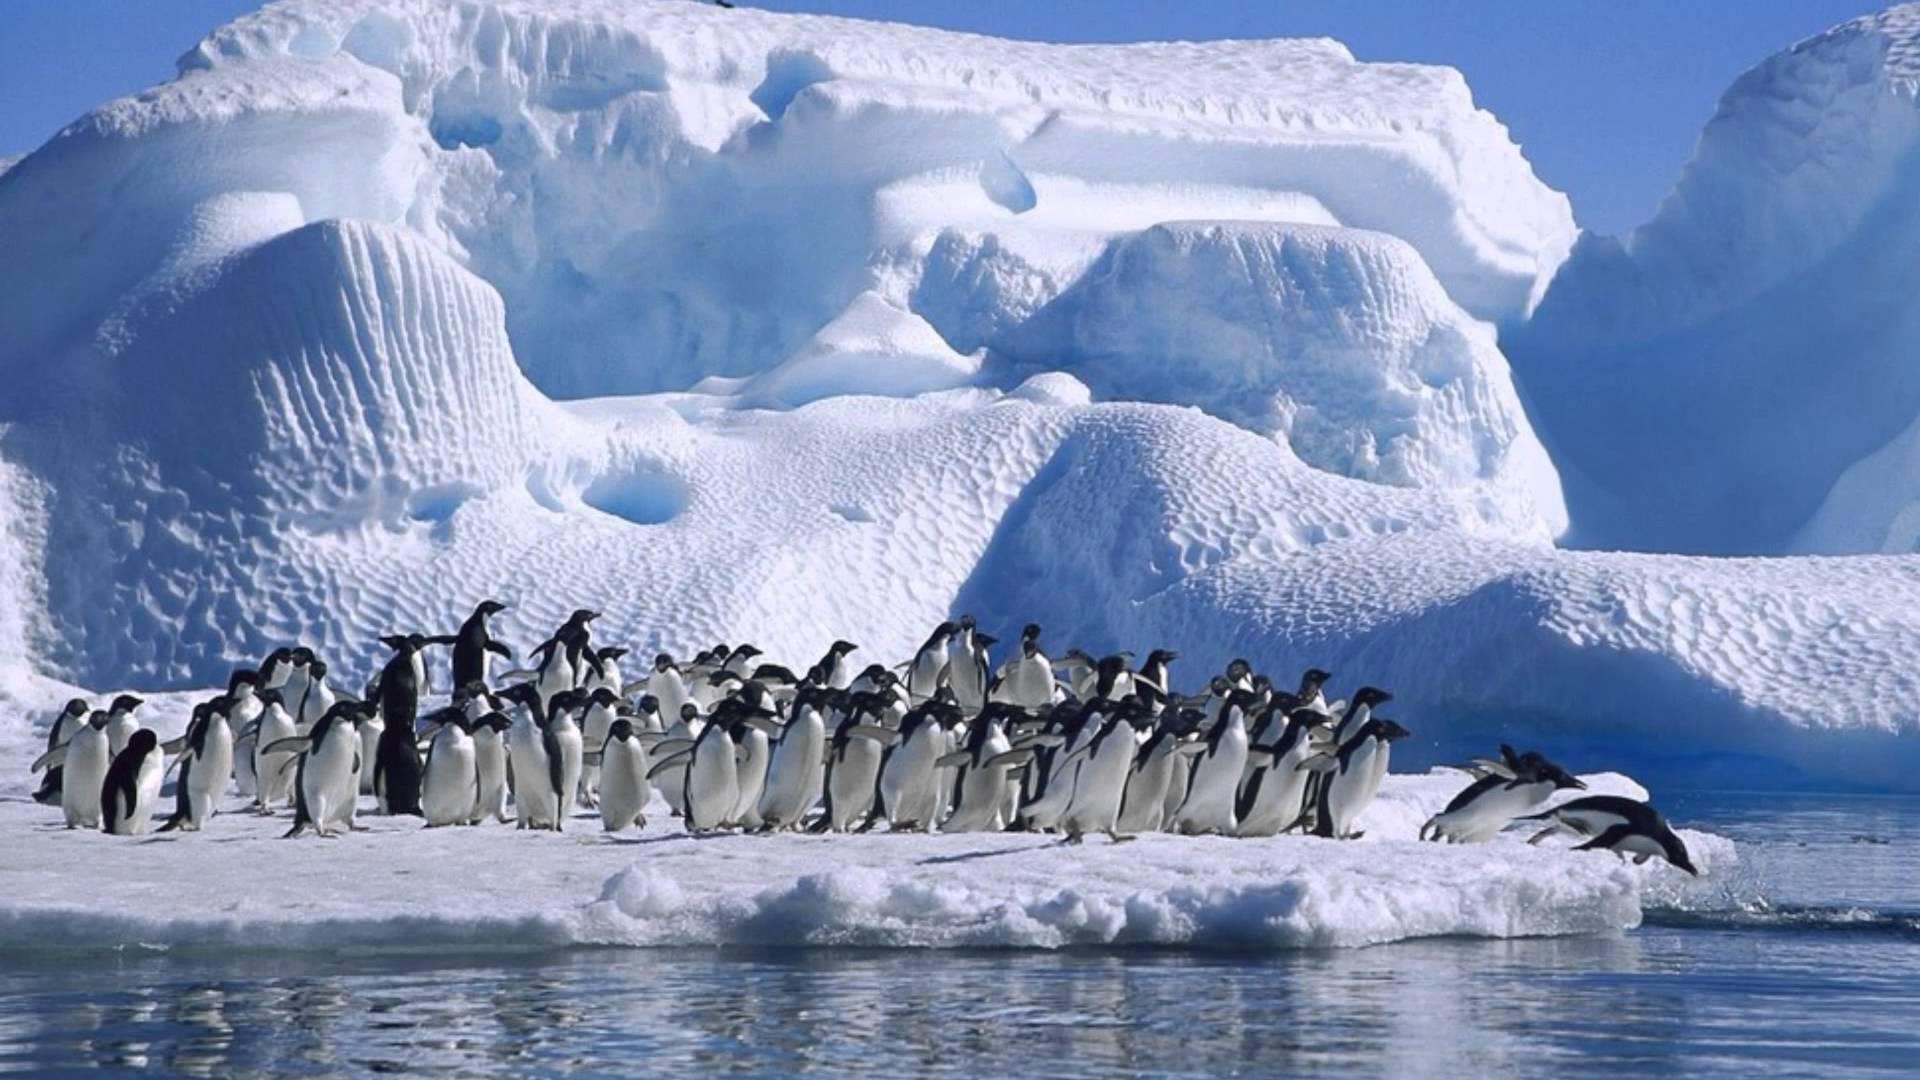 Загадочное место - Антарктида